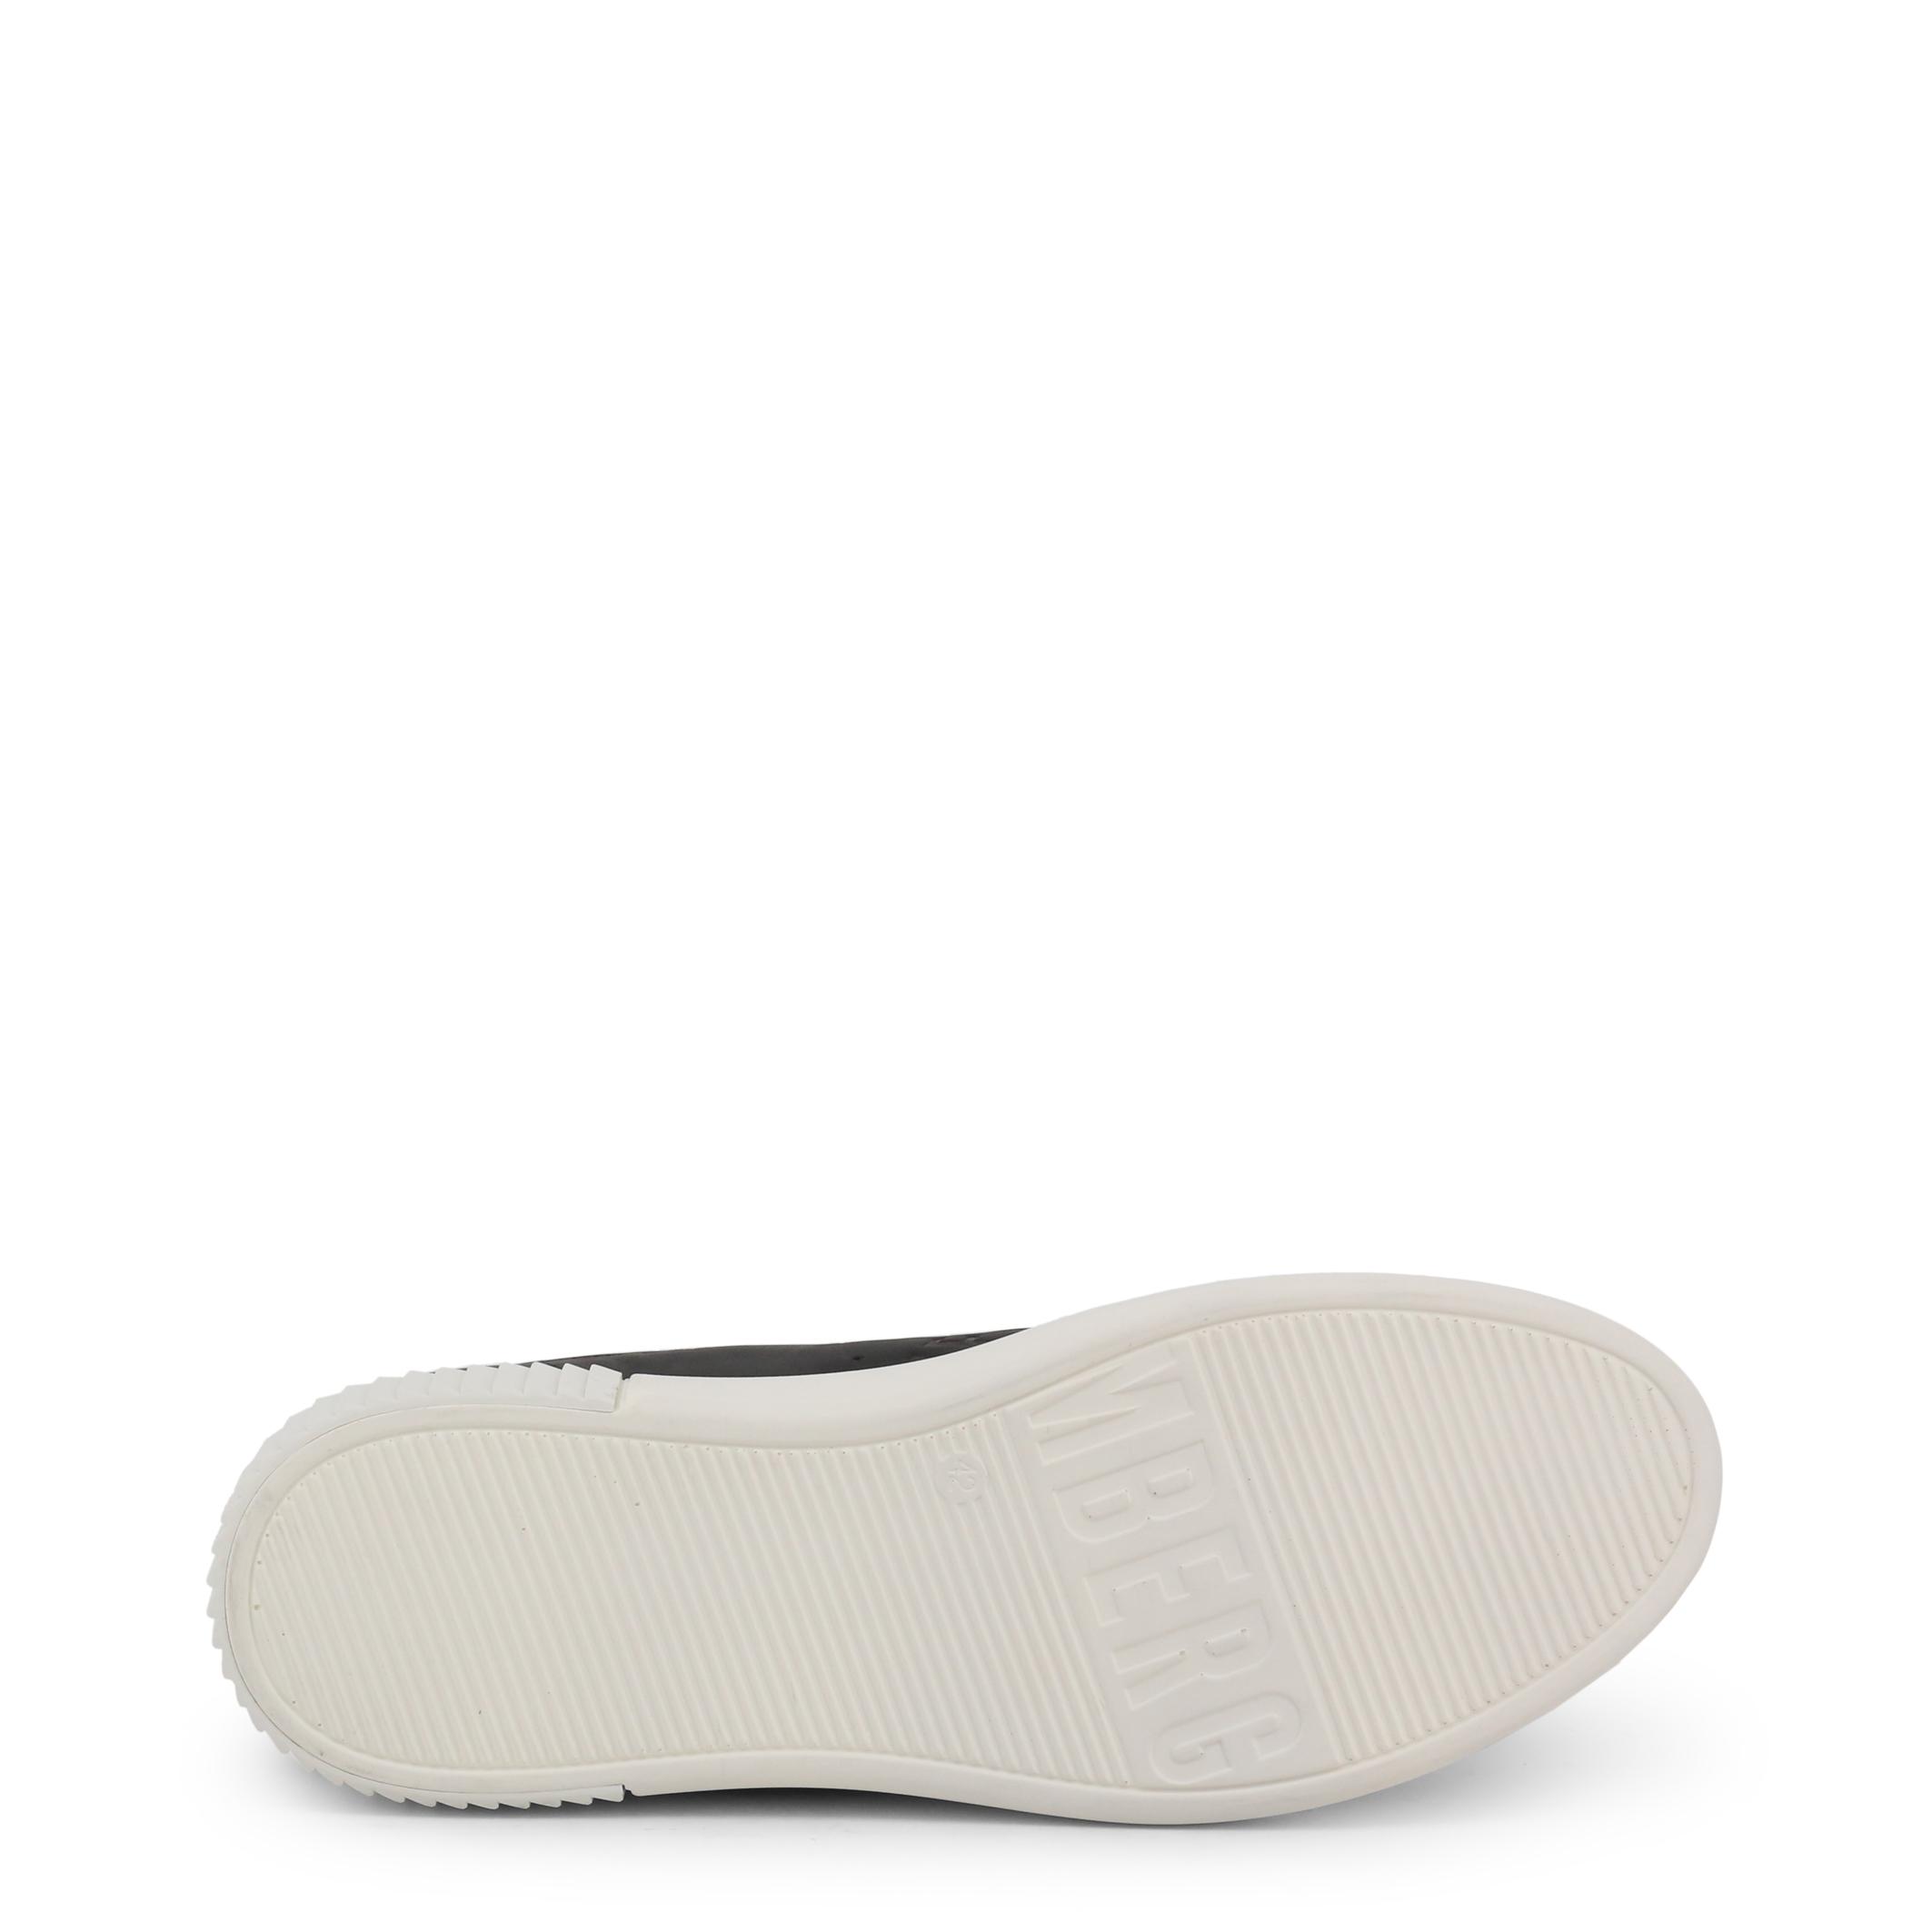 Chaussures de ville  Bikkembergs COSMOS_2100 black